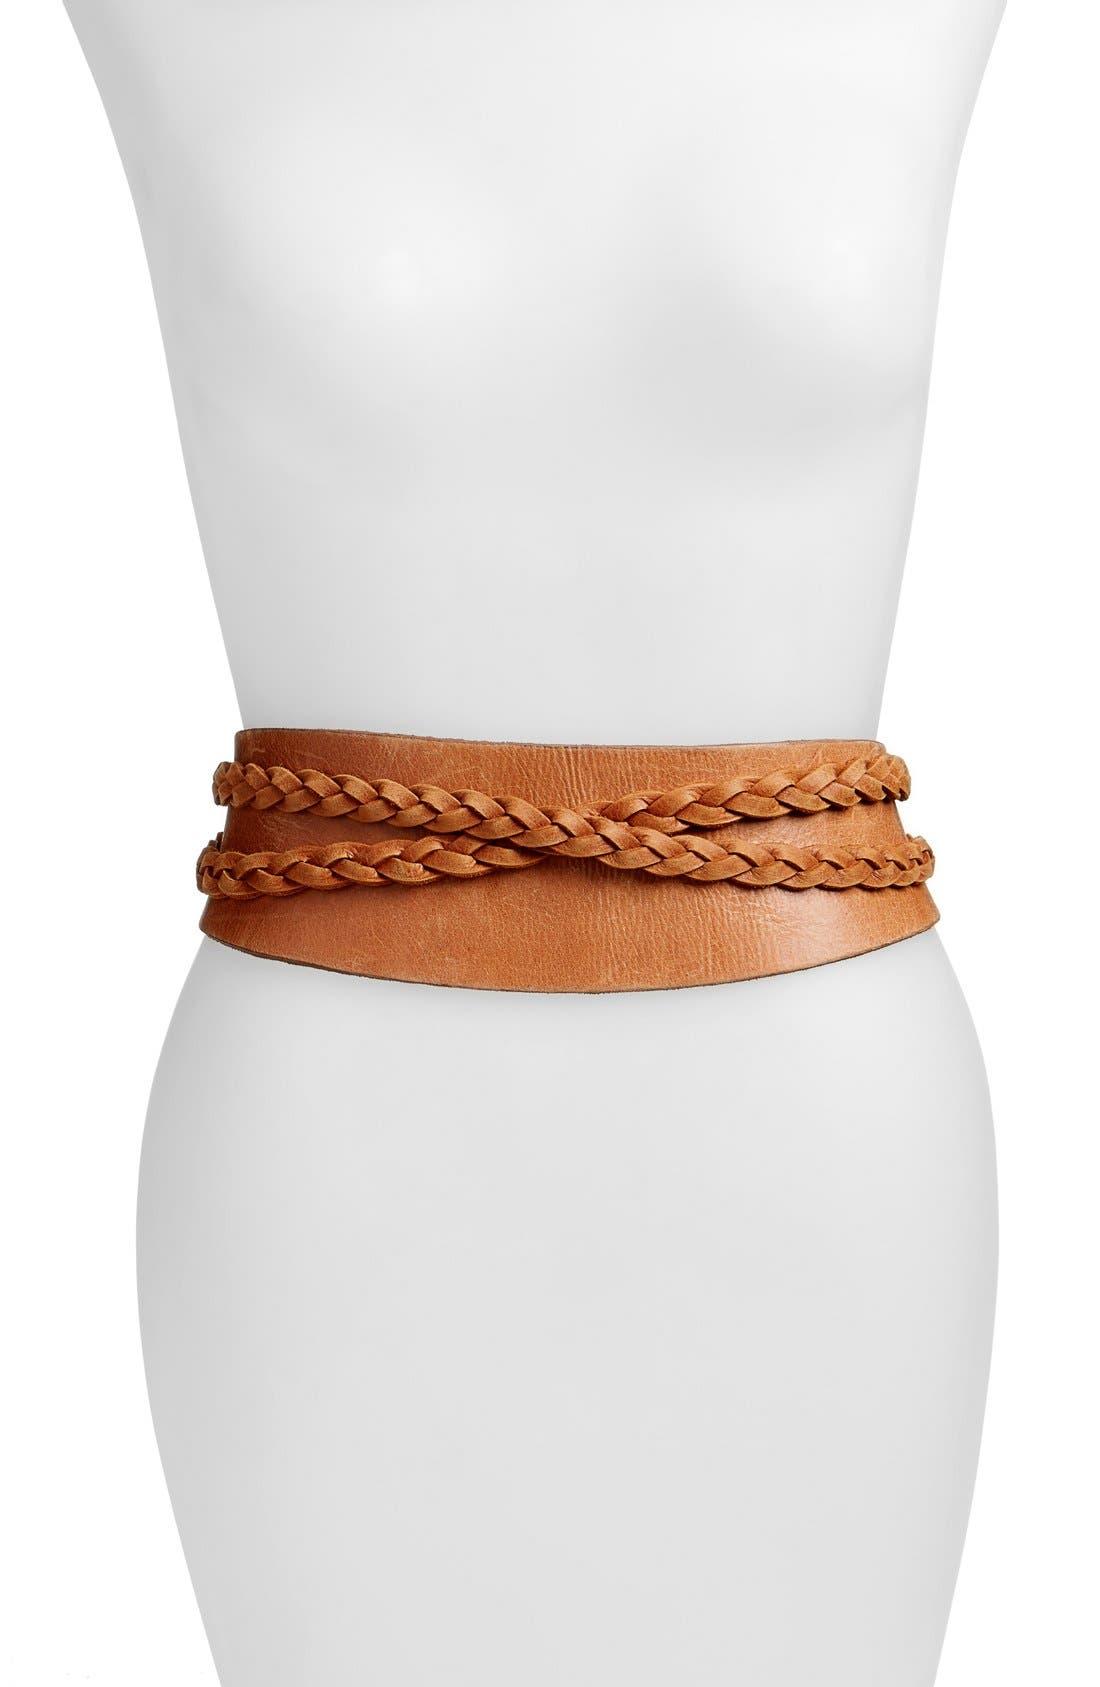 Alternate Image 1 Selected - Ada 'Dakota' Braided Leather Wrap Belt